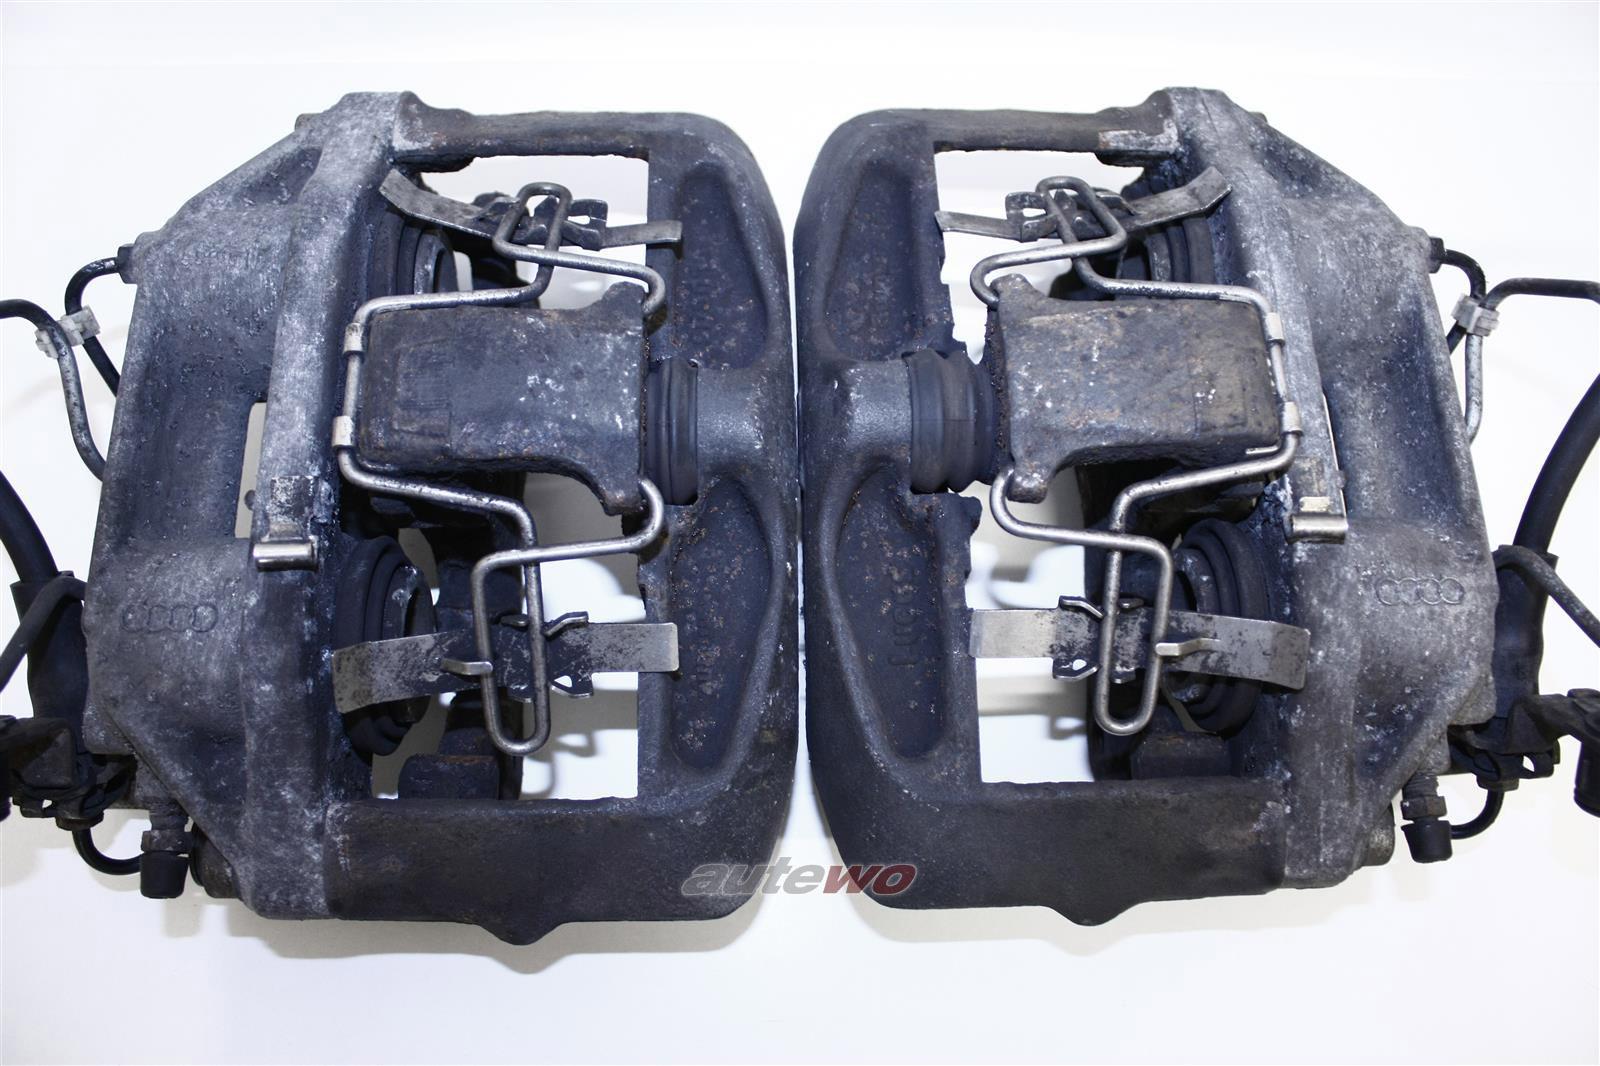 audi s4 b5 a6 4b a8 d2 bremse hp2 323x30mm vorne. Black Bedroom Furniture Sets. Home Design Ideas